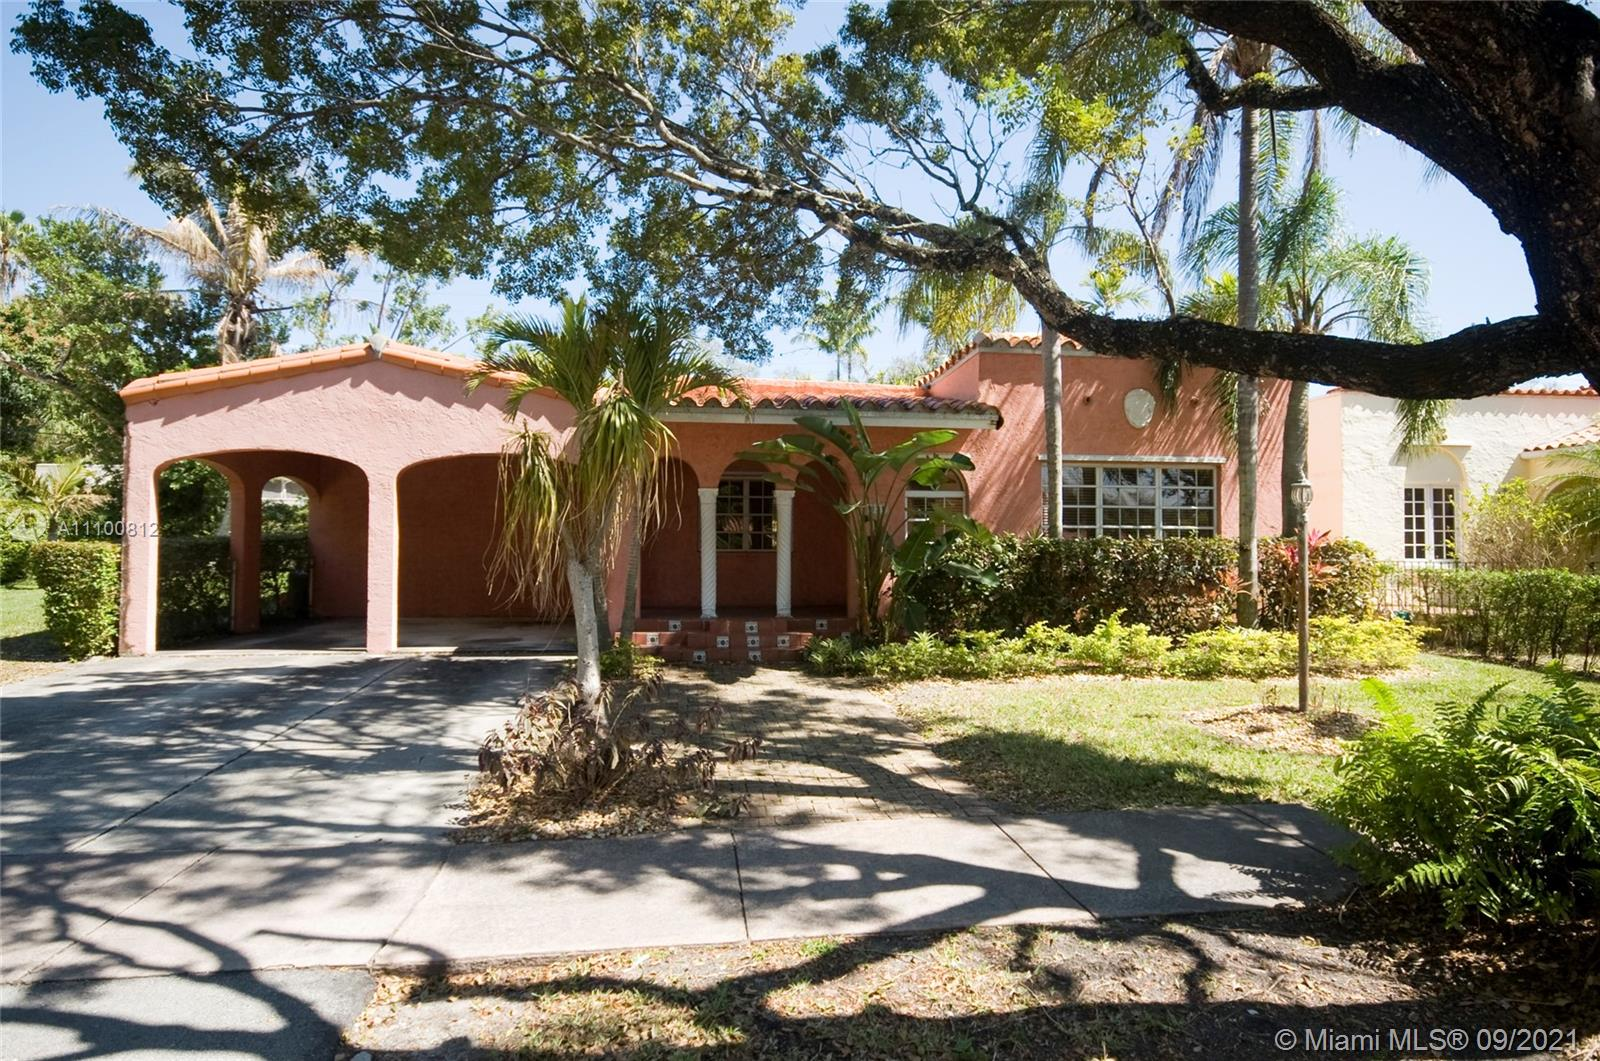 Single Family Home,For Sale,831 Pizarro St, Coral Gables, Florida 33134,Brickell,realty,broker,condos near me